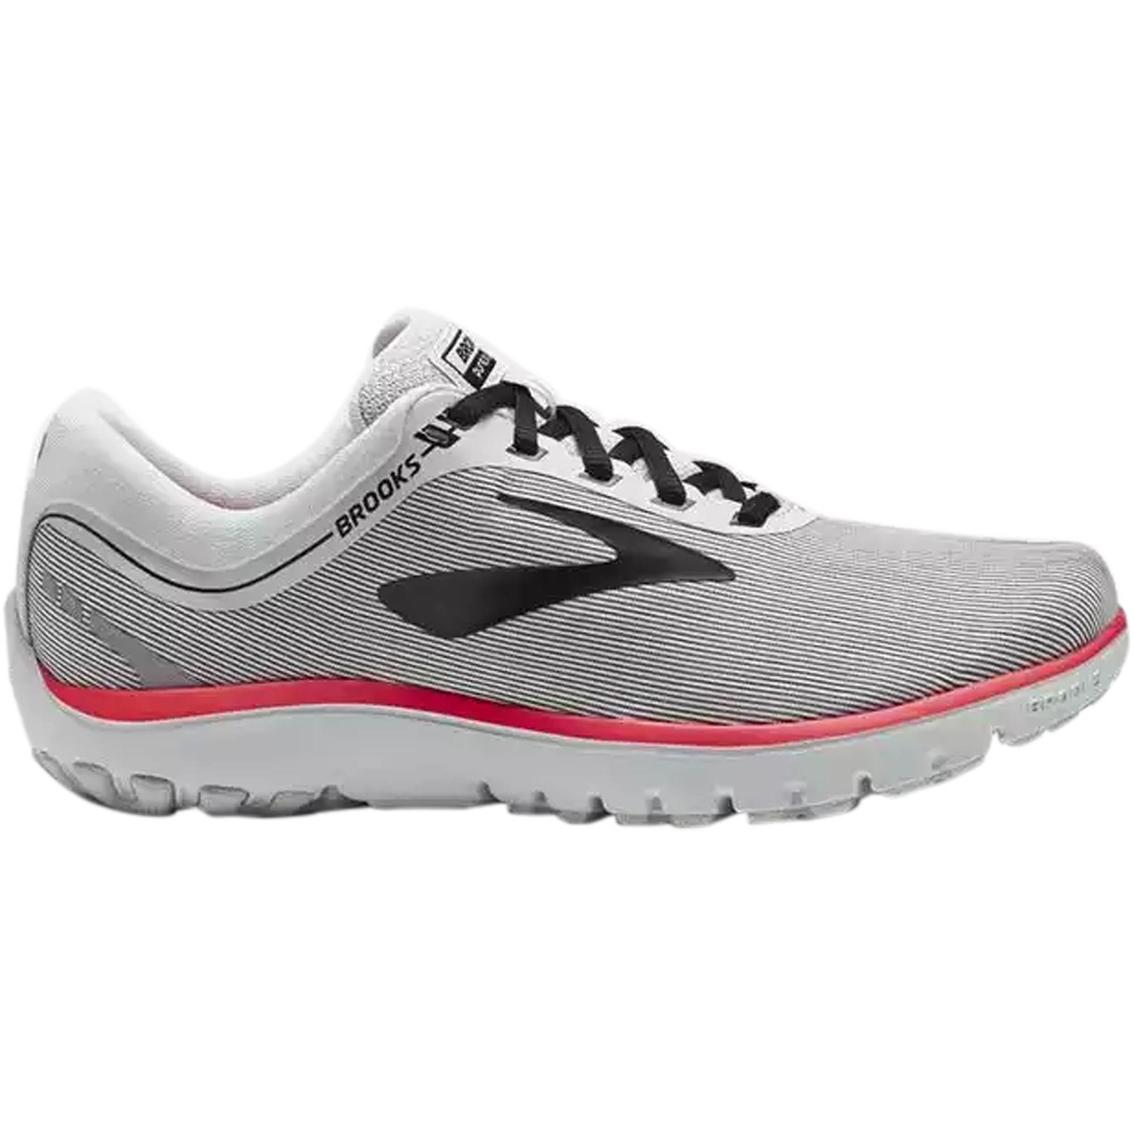 e03df9218c404 Brooks Women s Pureflow 7 Running Shoes